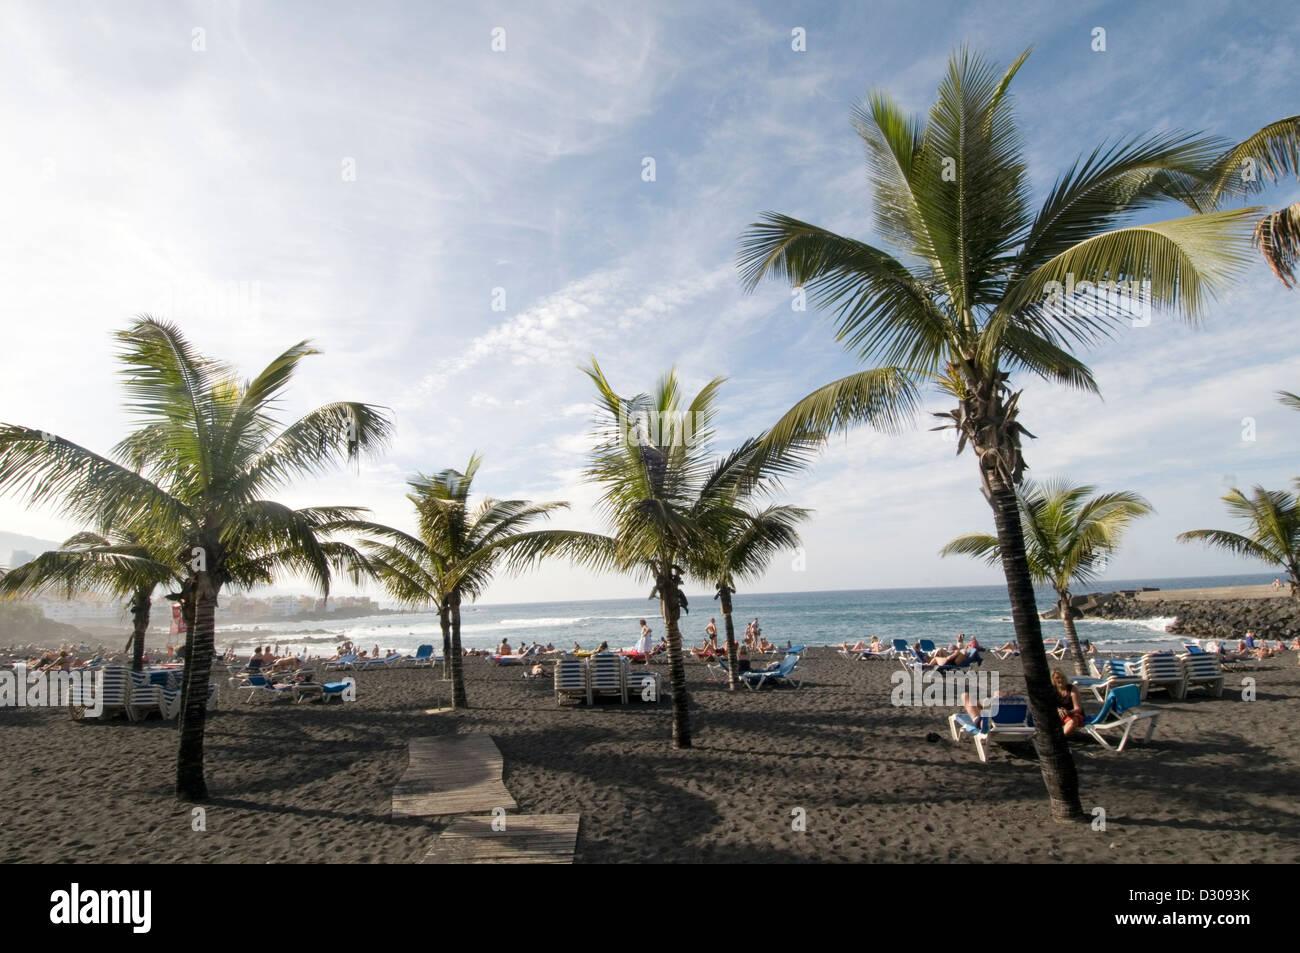 puerto cruz tenerife beach beaches black sand sandy palm tree trees holiday makers holidaymakers sunbathing sunbather - Stock Image